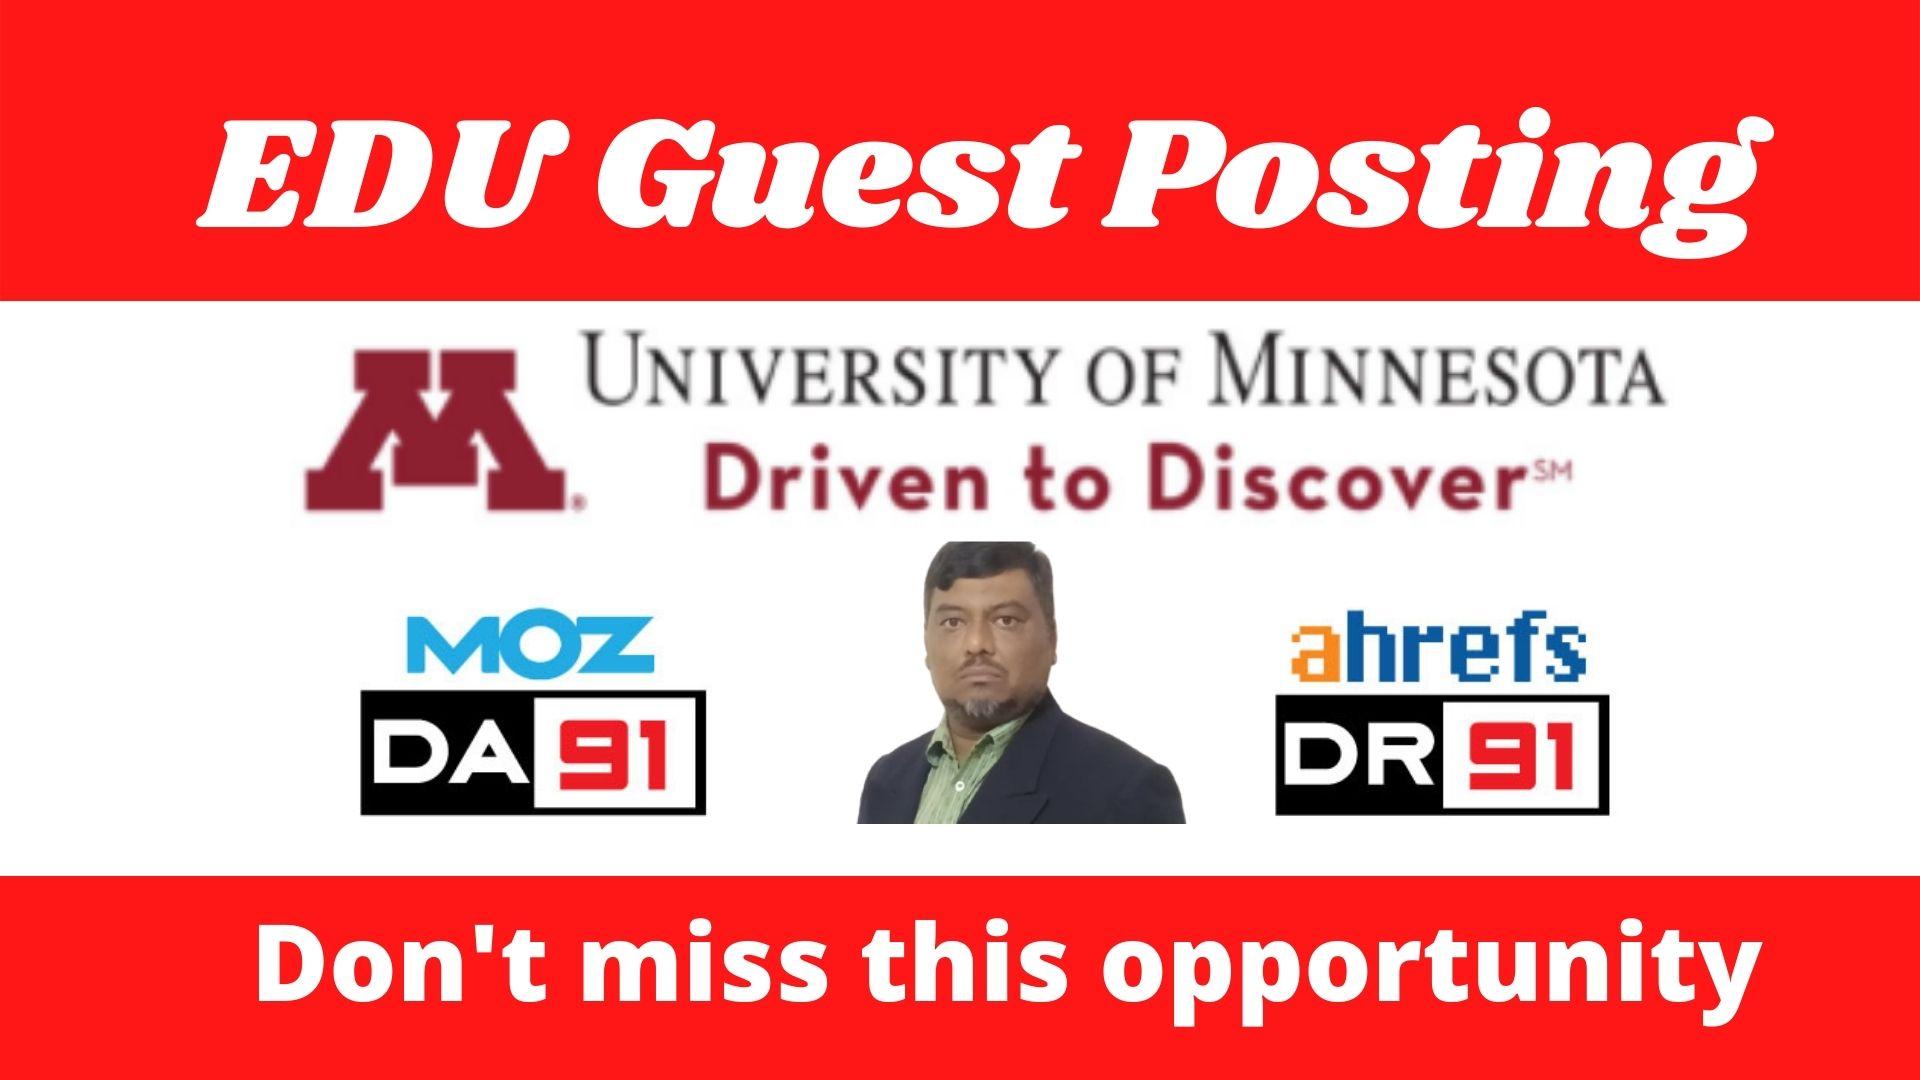 Edu Guest Post on UMN. edu DA91,  DR91 DoFoIIow Link